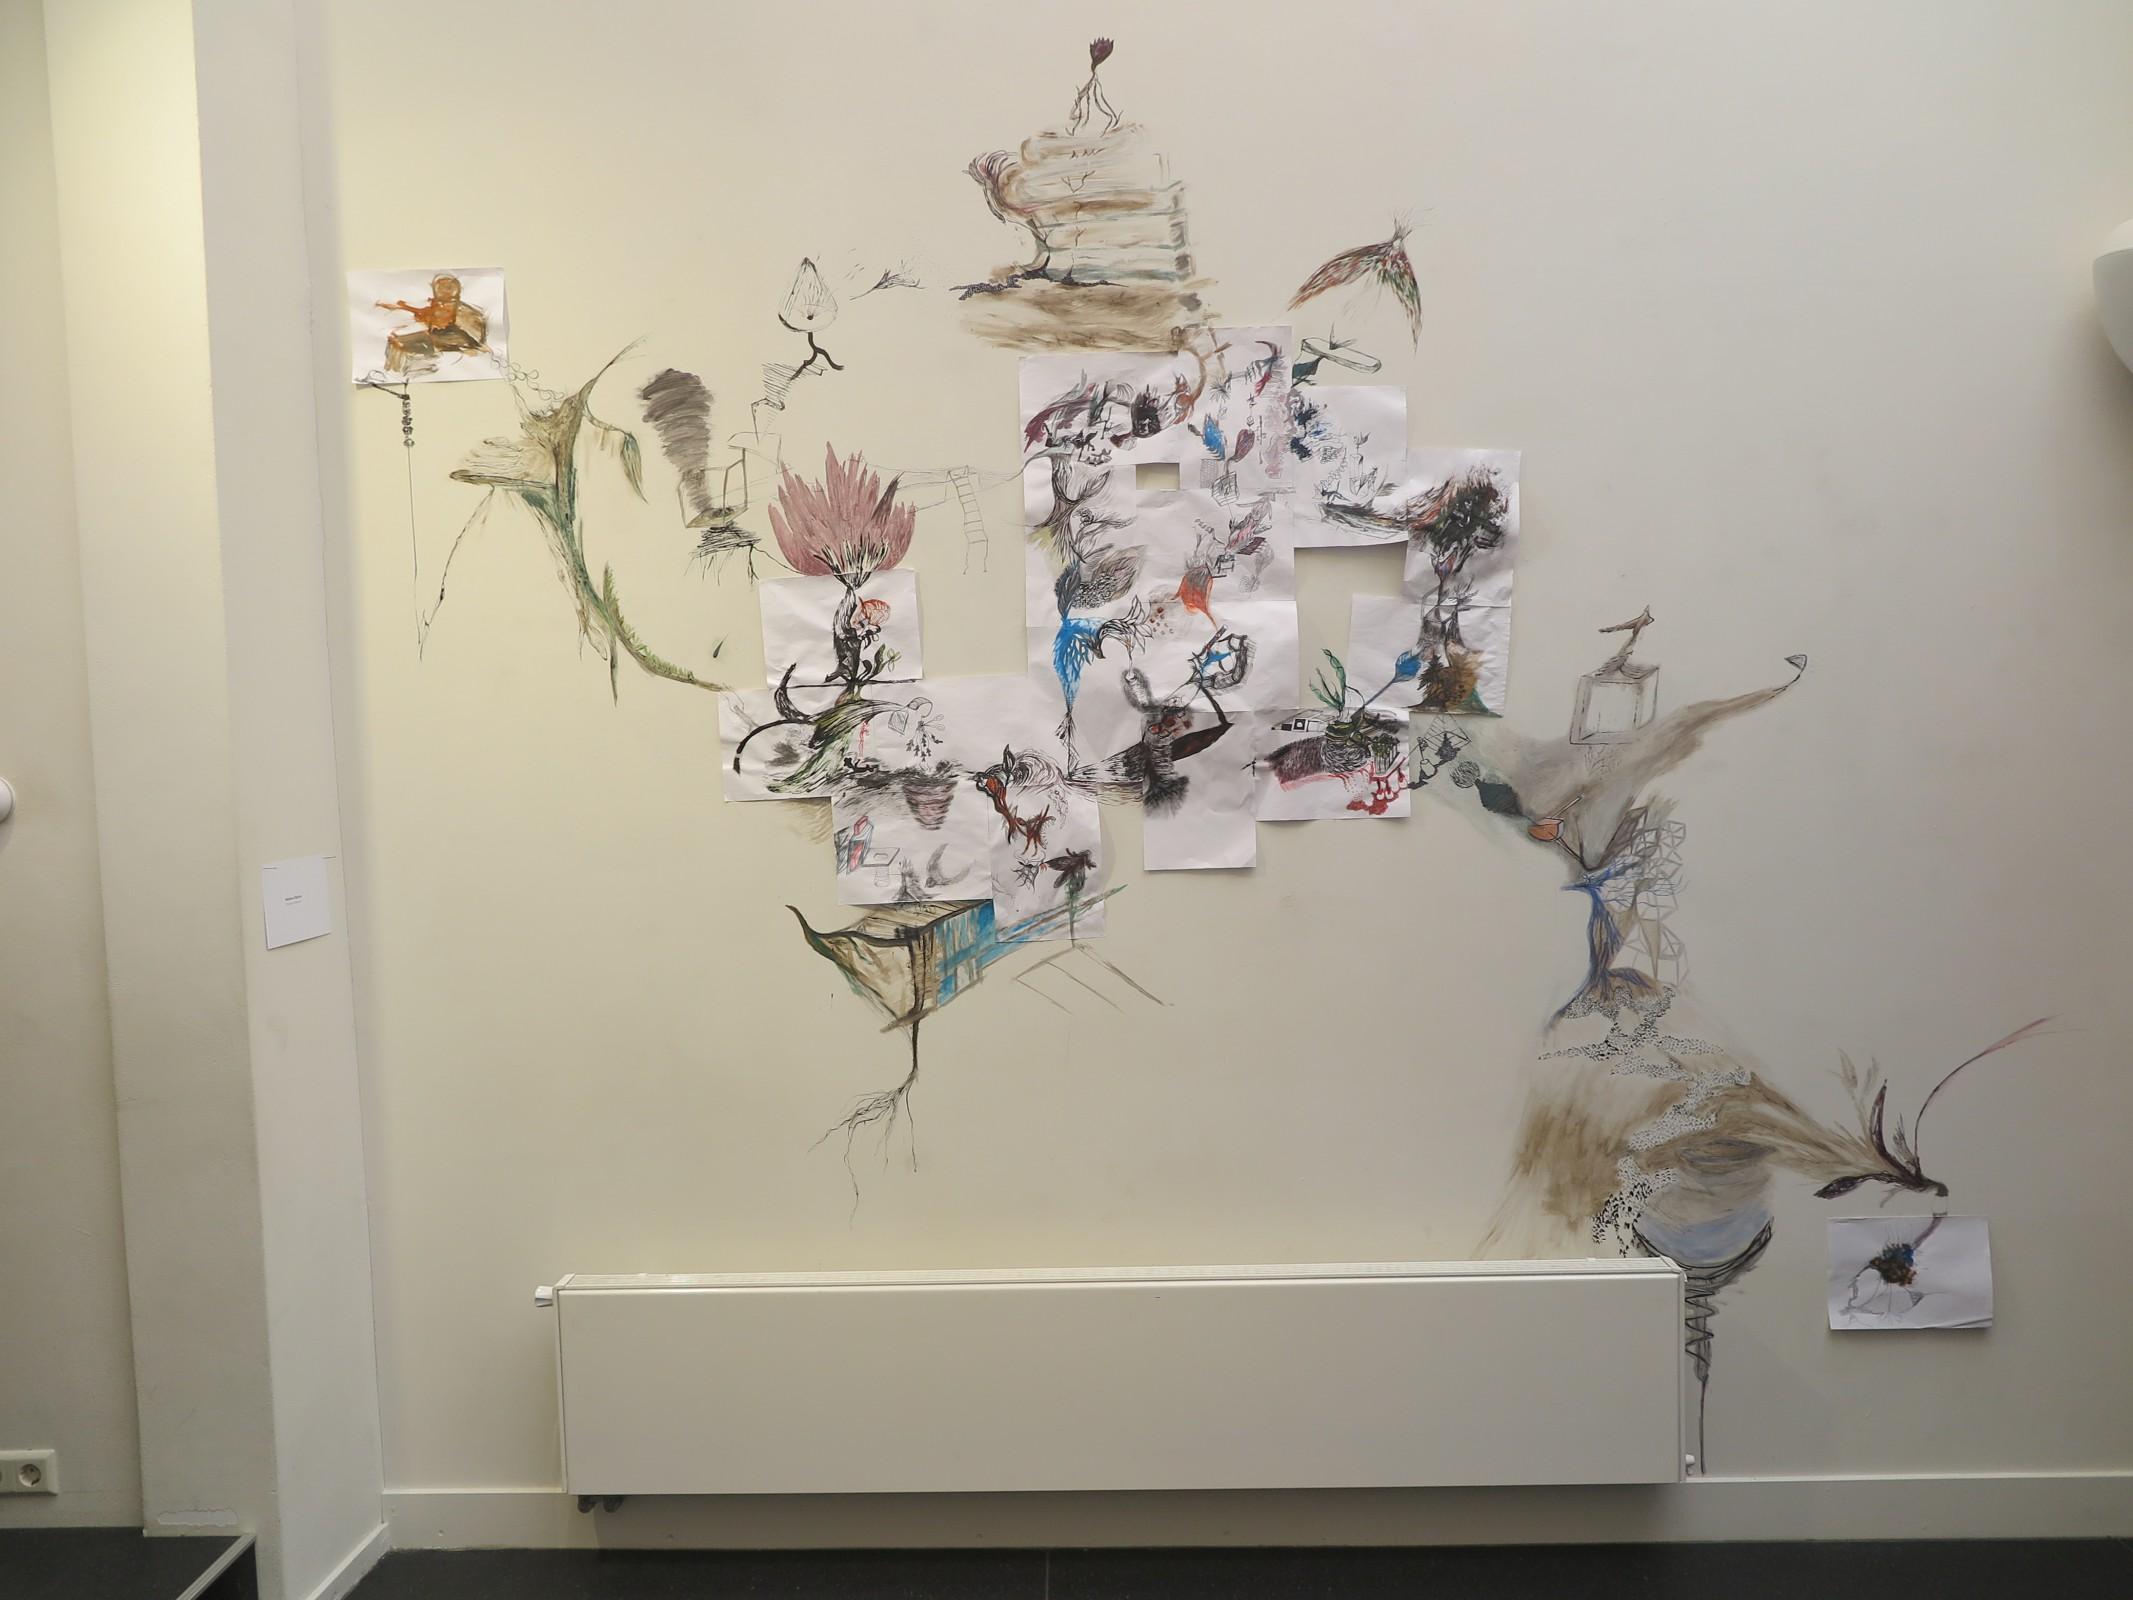 Marloes Elbertse - Chamber of reflection - 2015